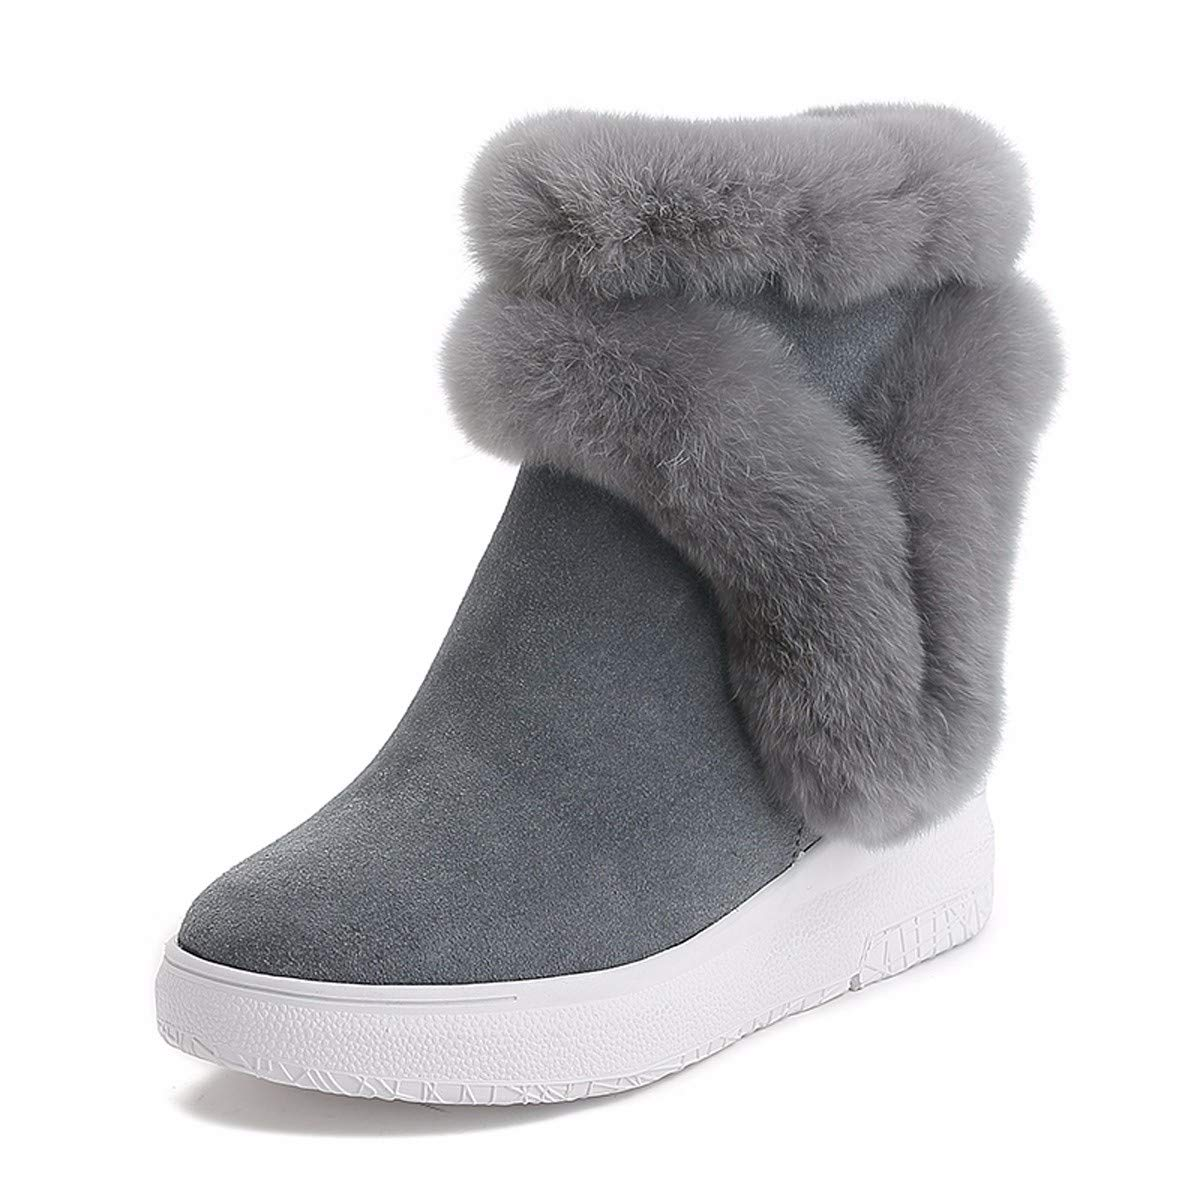 HBDLH Damenschuhe Baitao Geschliffen Heel 7 cm Schnee - - - Leder - Wärme - Baumwoll - Schuhe Midbarrel Dicke Sohle Innerer Größe Kurze Stiefel a72c1b